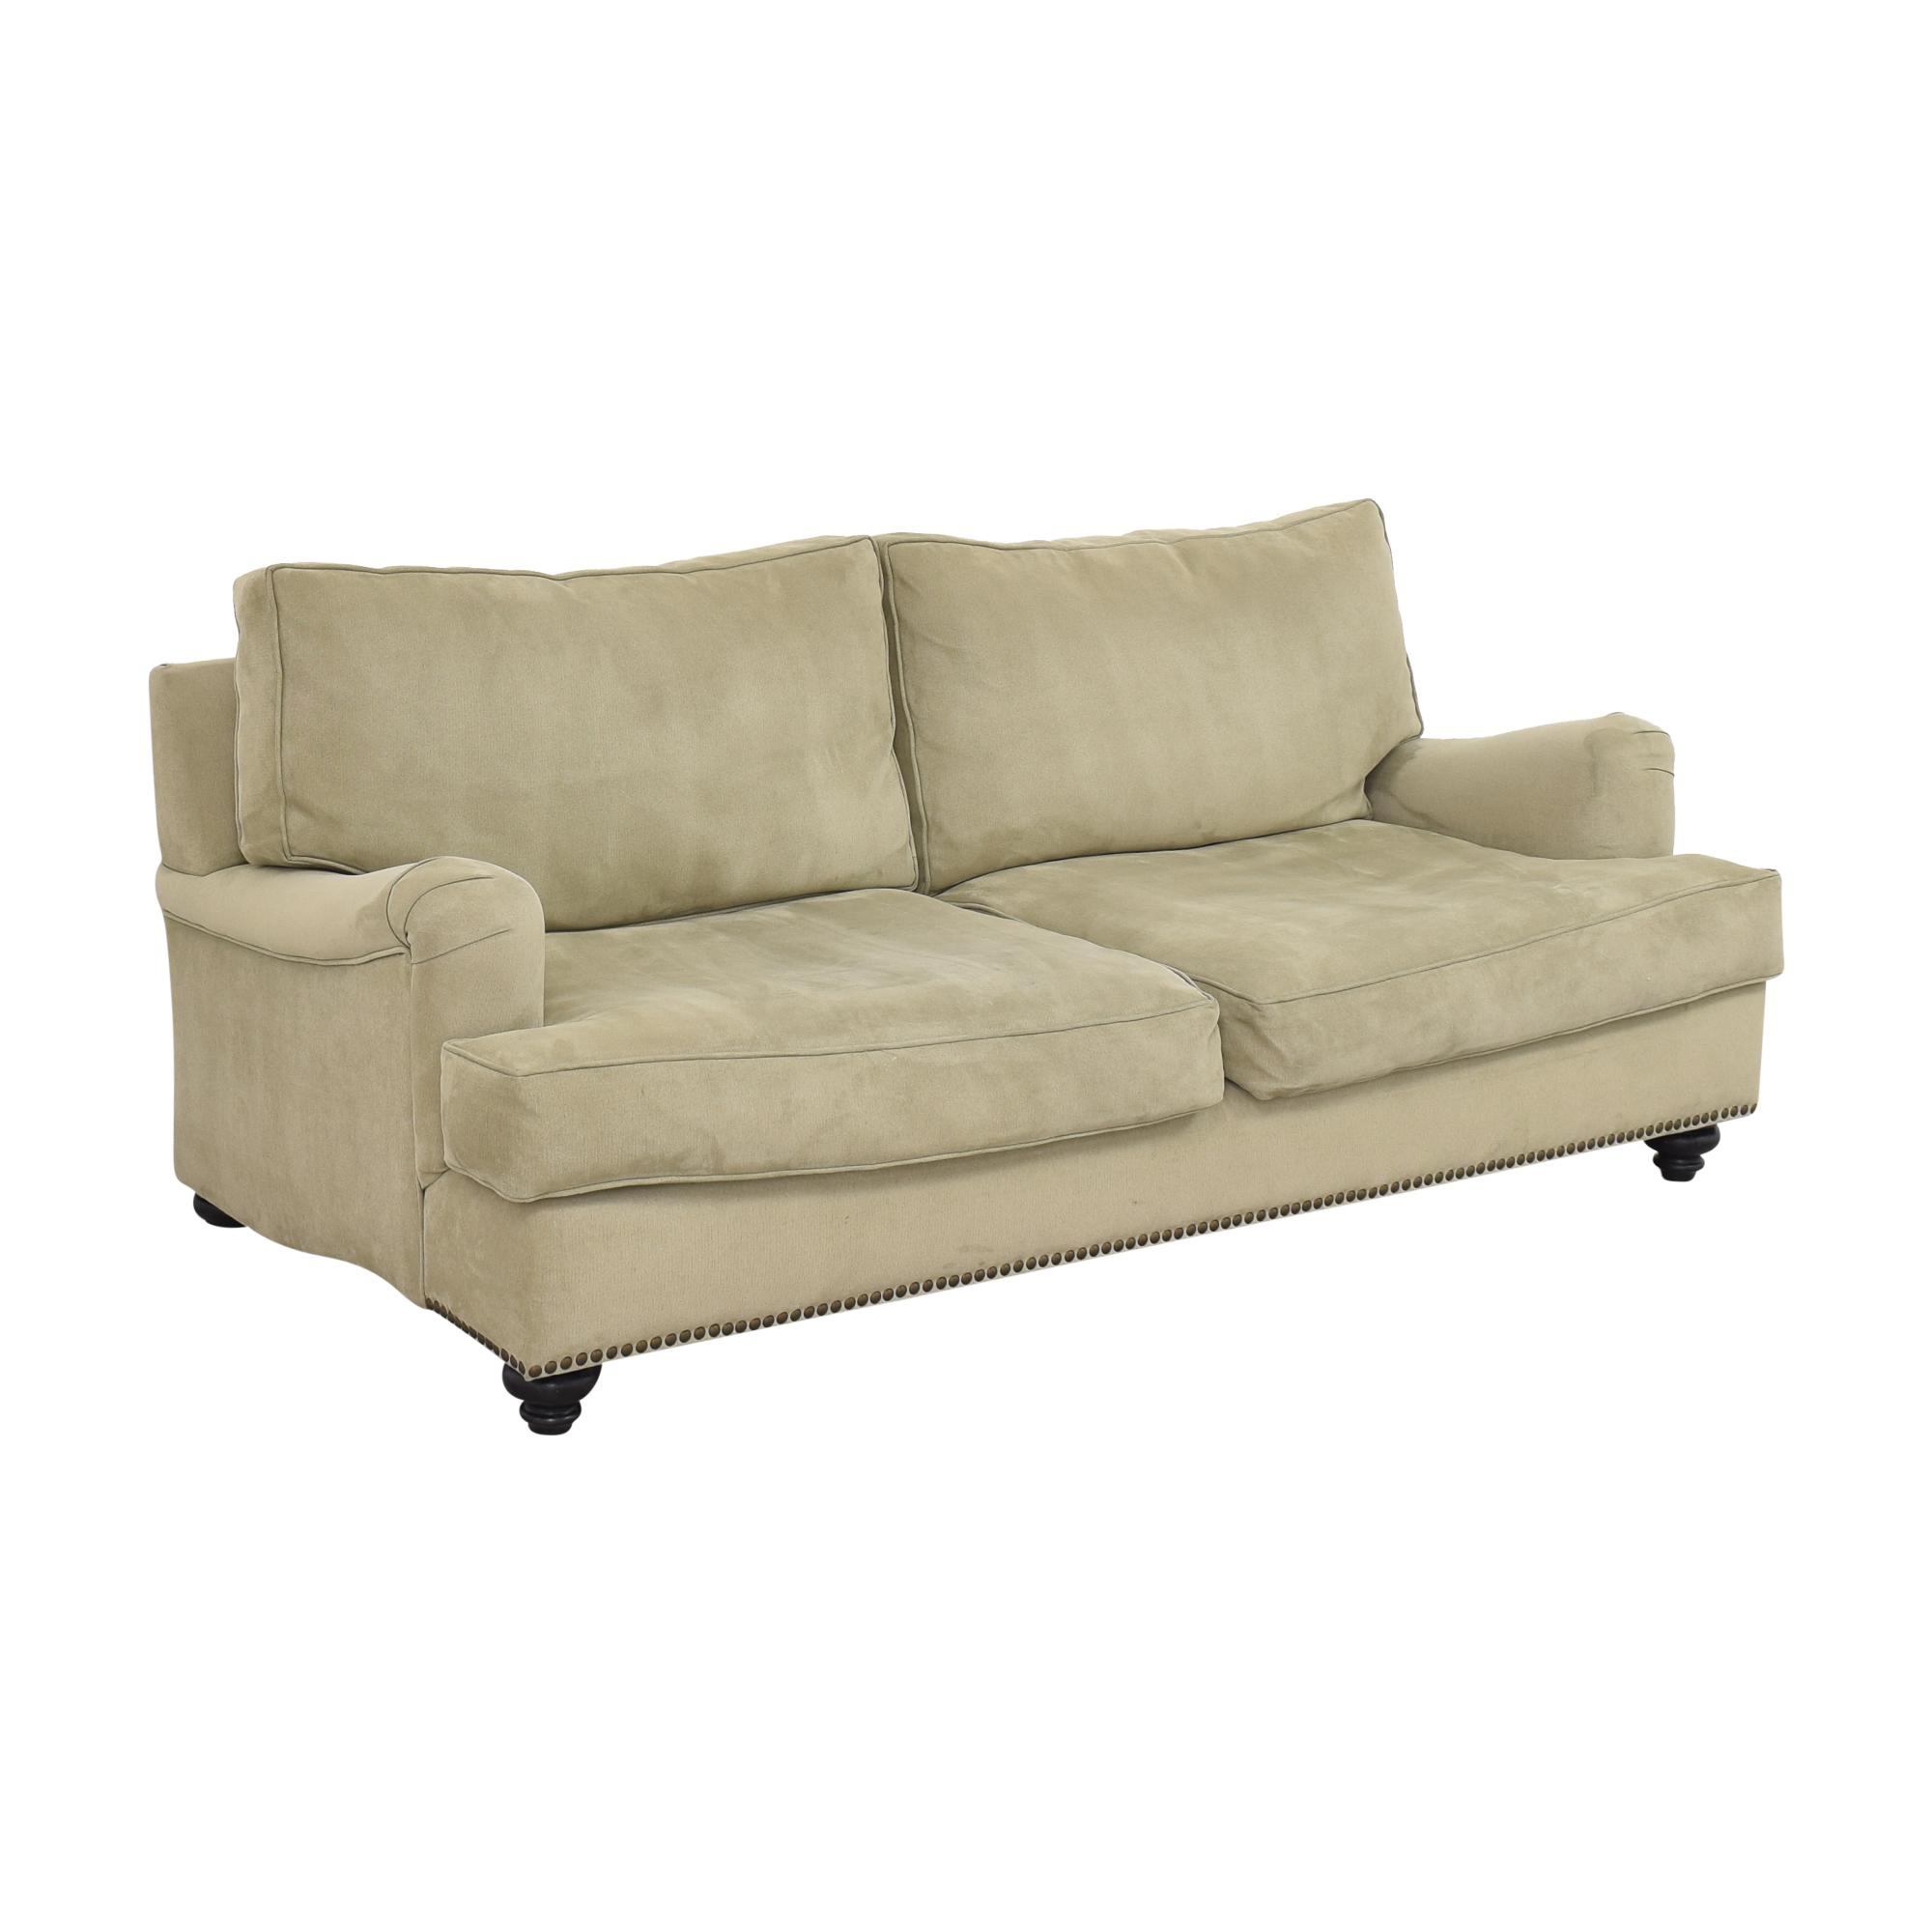 shop  Custom Two Cushion Sofa online